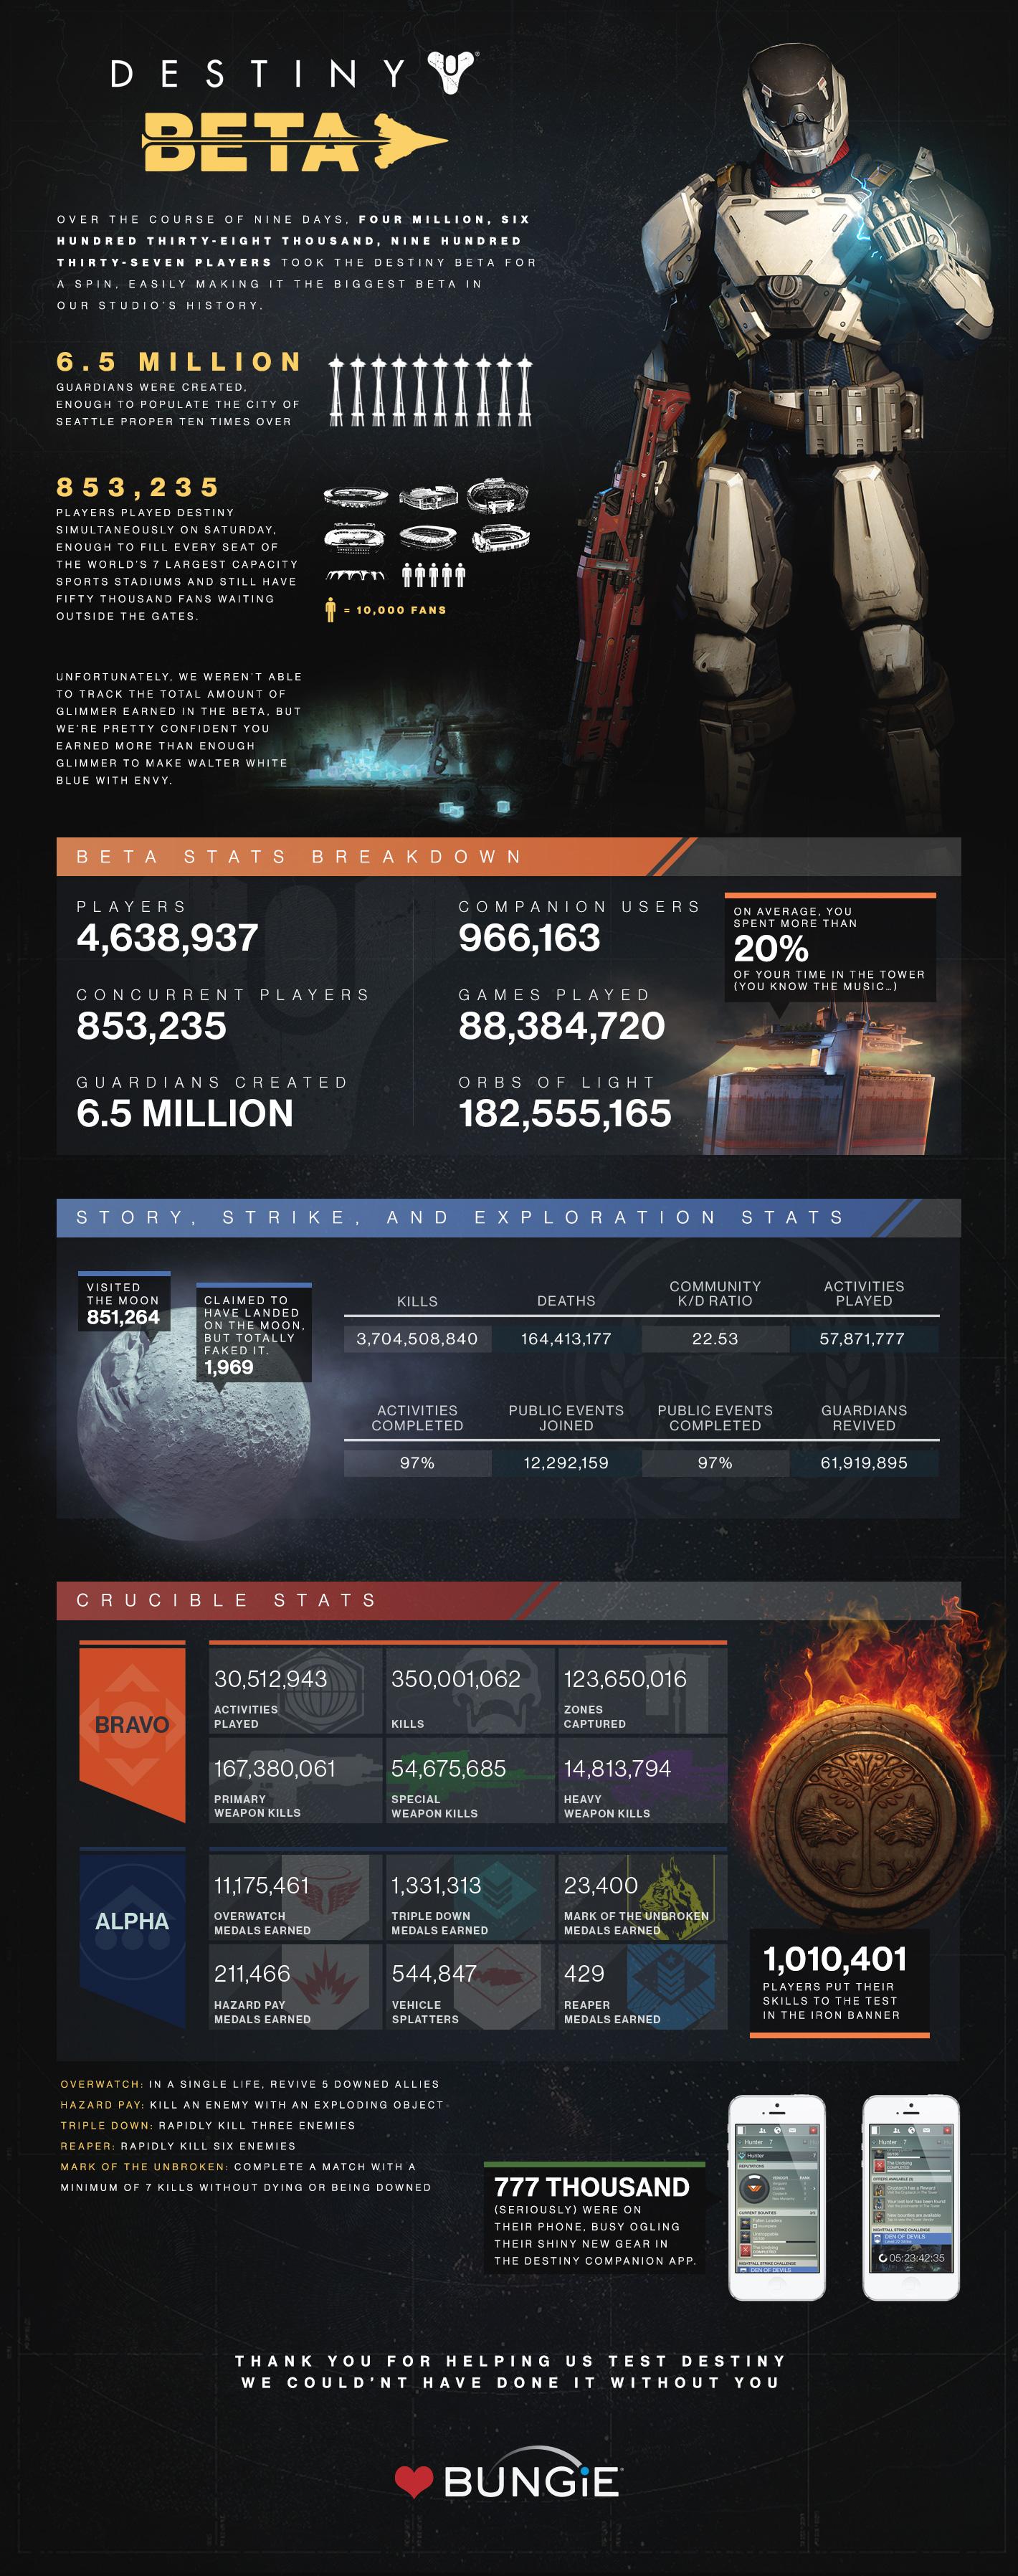 Worksheet Destiny Facts destiny facts scalien